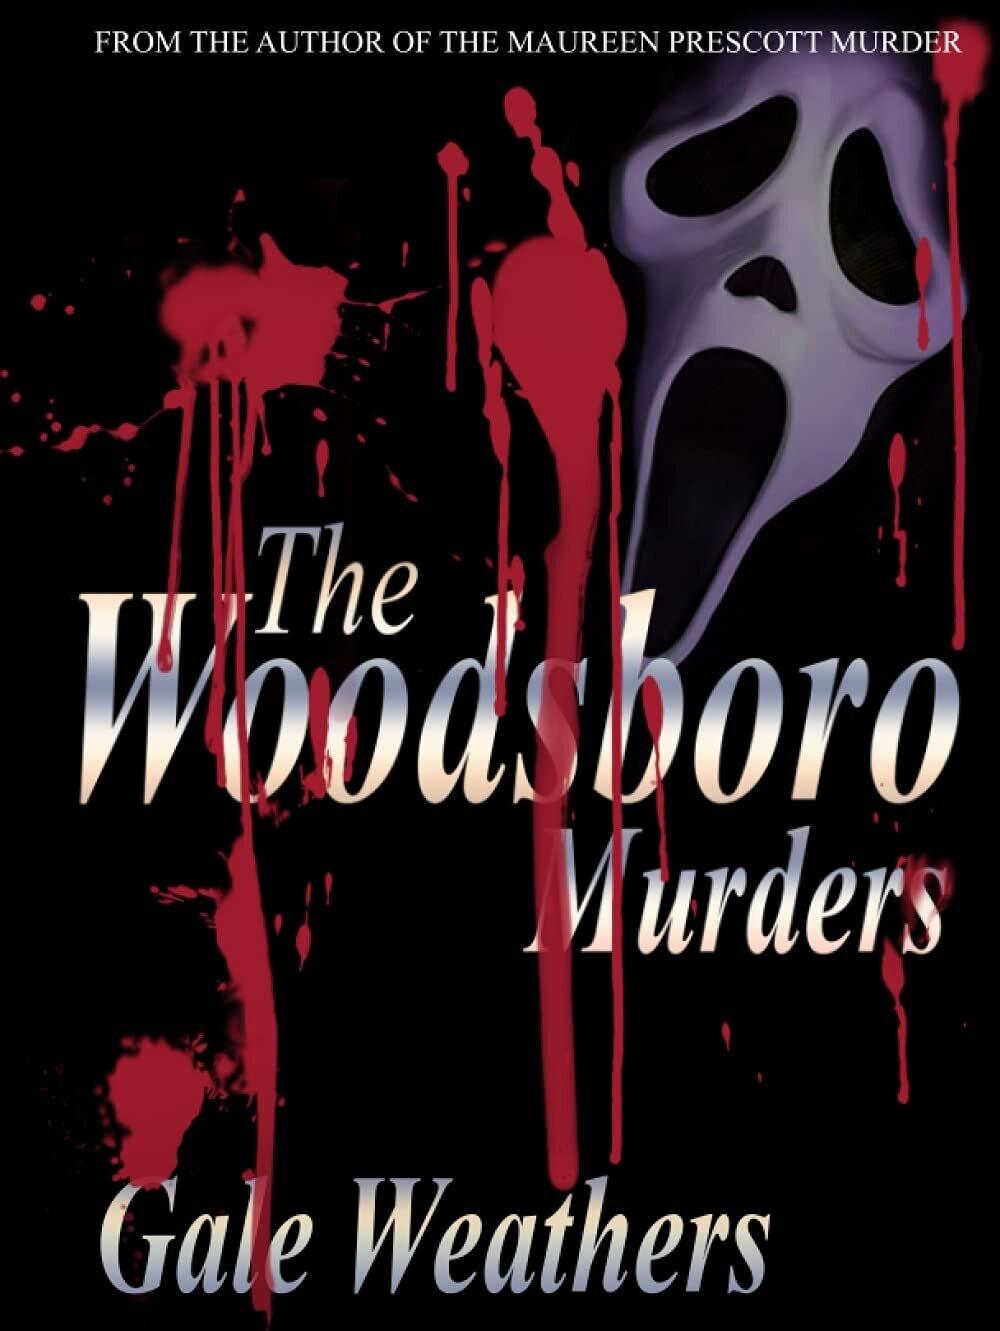 The Woodsboro Murders by Gale Weathers (SCREAM) Hardback Book [Horror Movie Prop Replica]